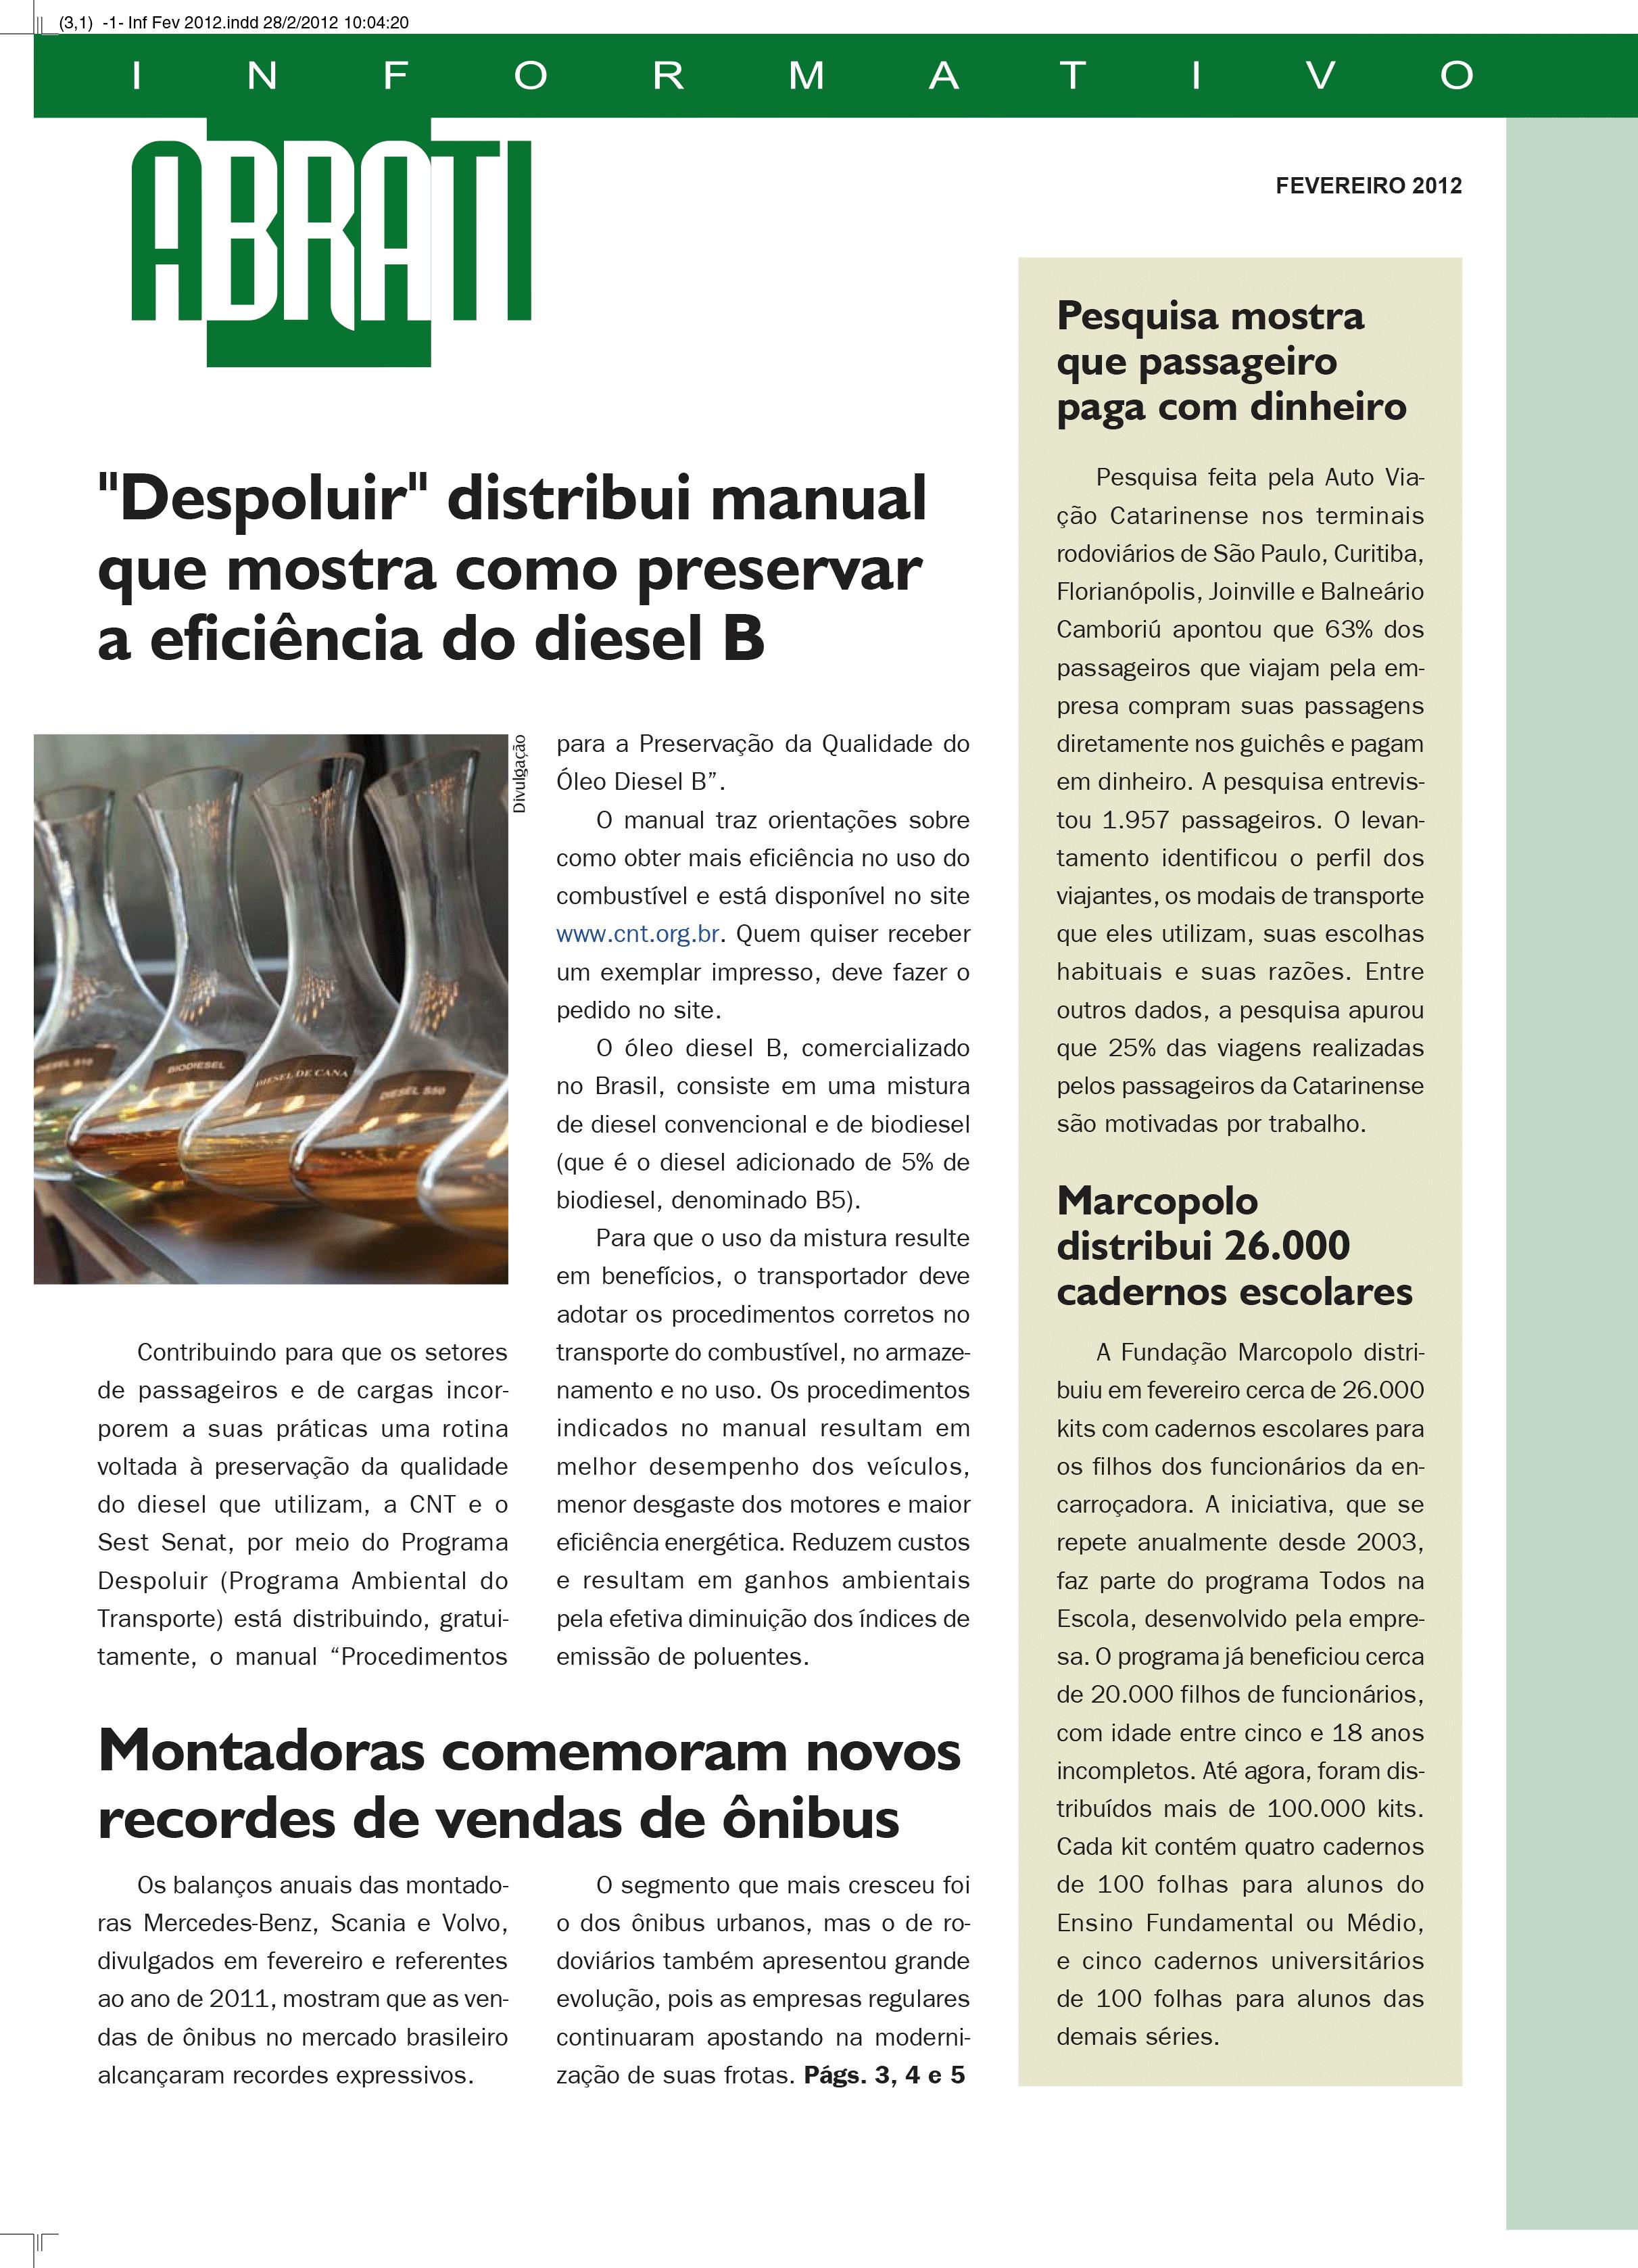 Informativo Fevereiro 2012